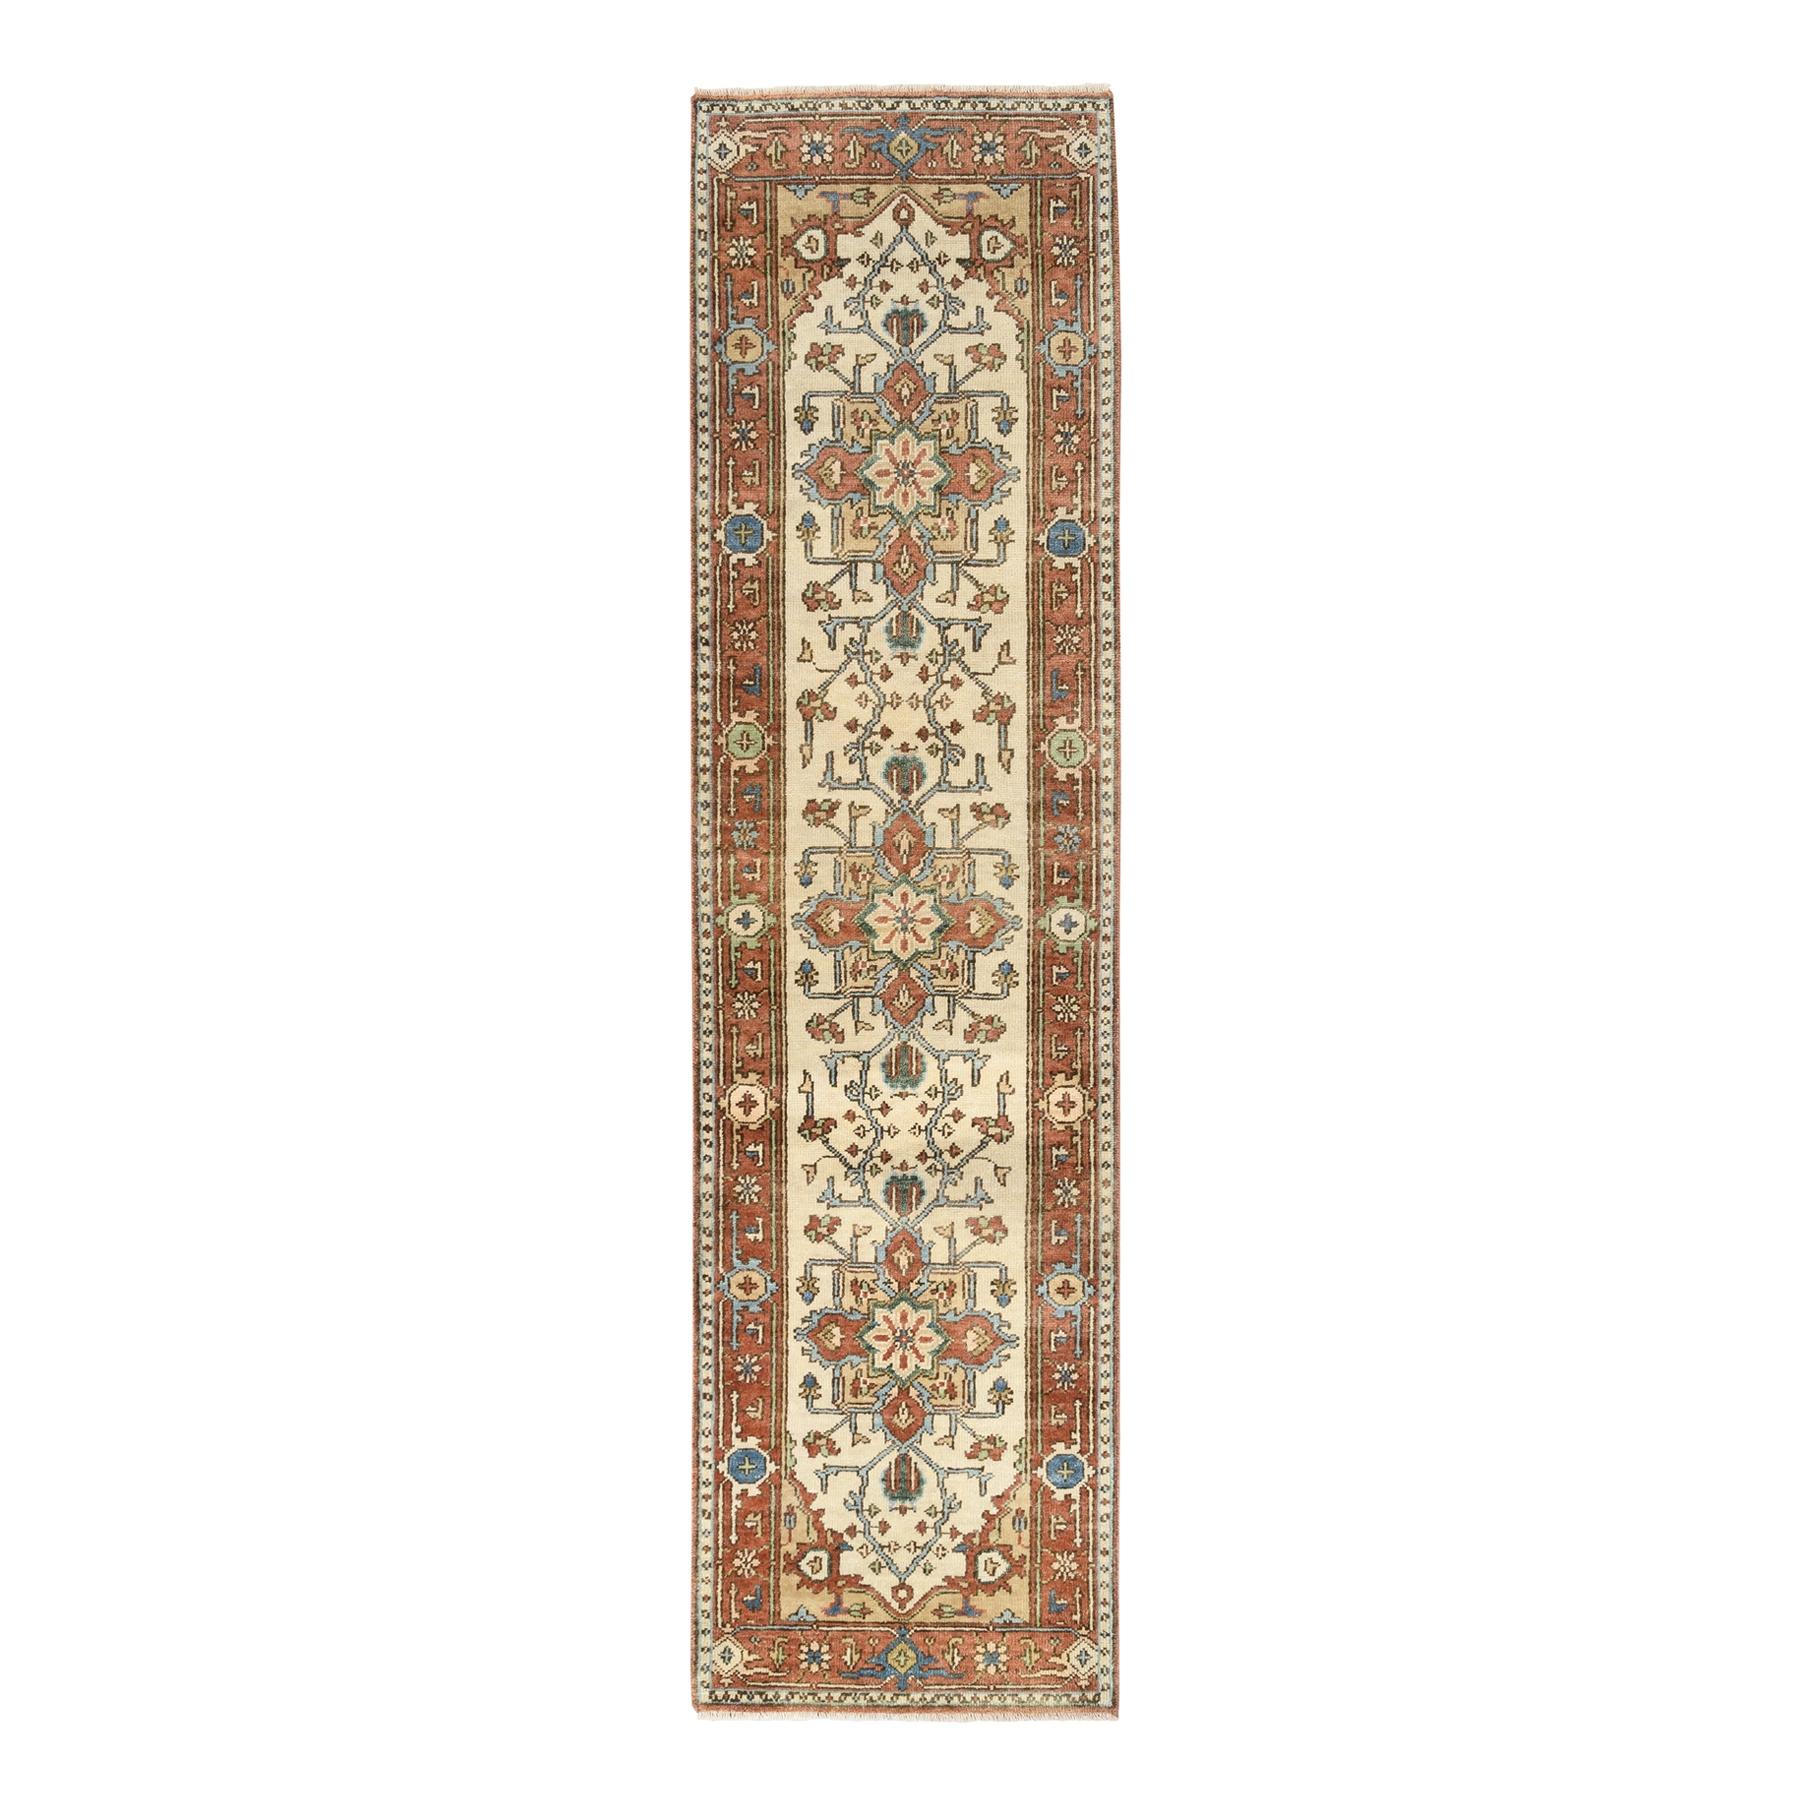 Serapi Heriz and Bakhshayesh Collection Hand Knotted Ivory Rug No: 1126342